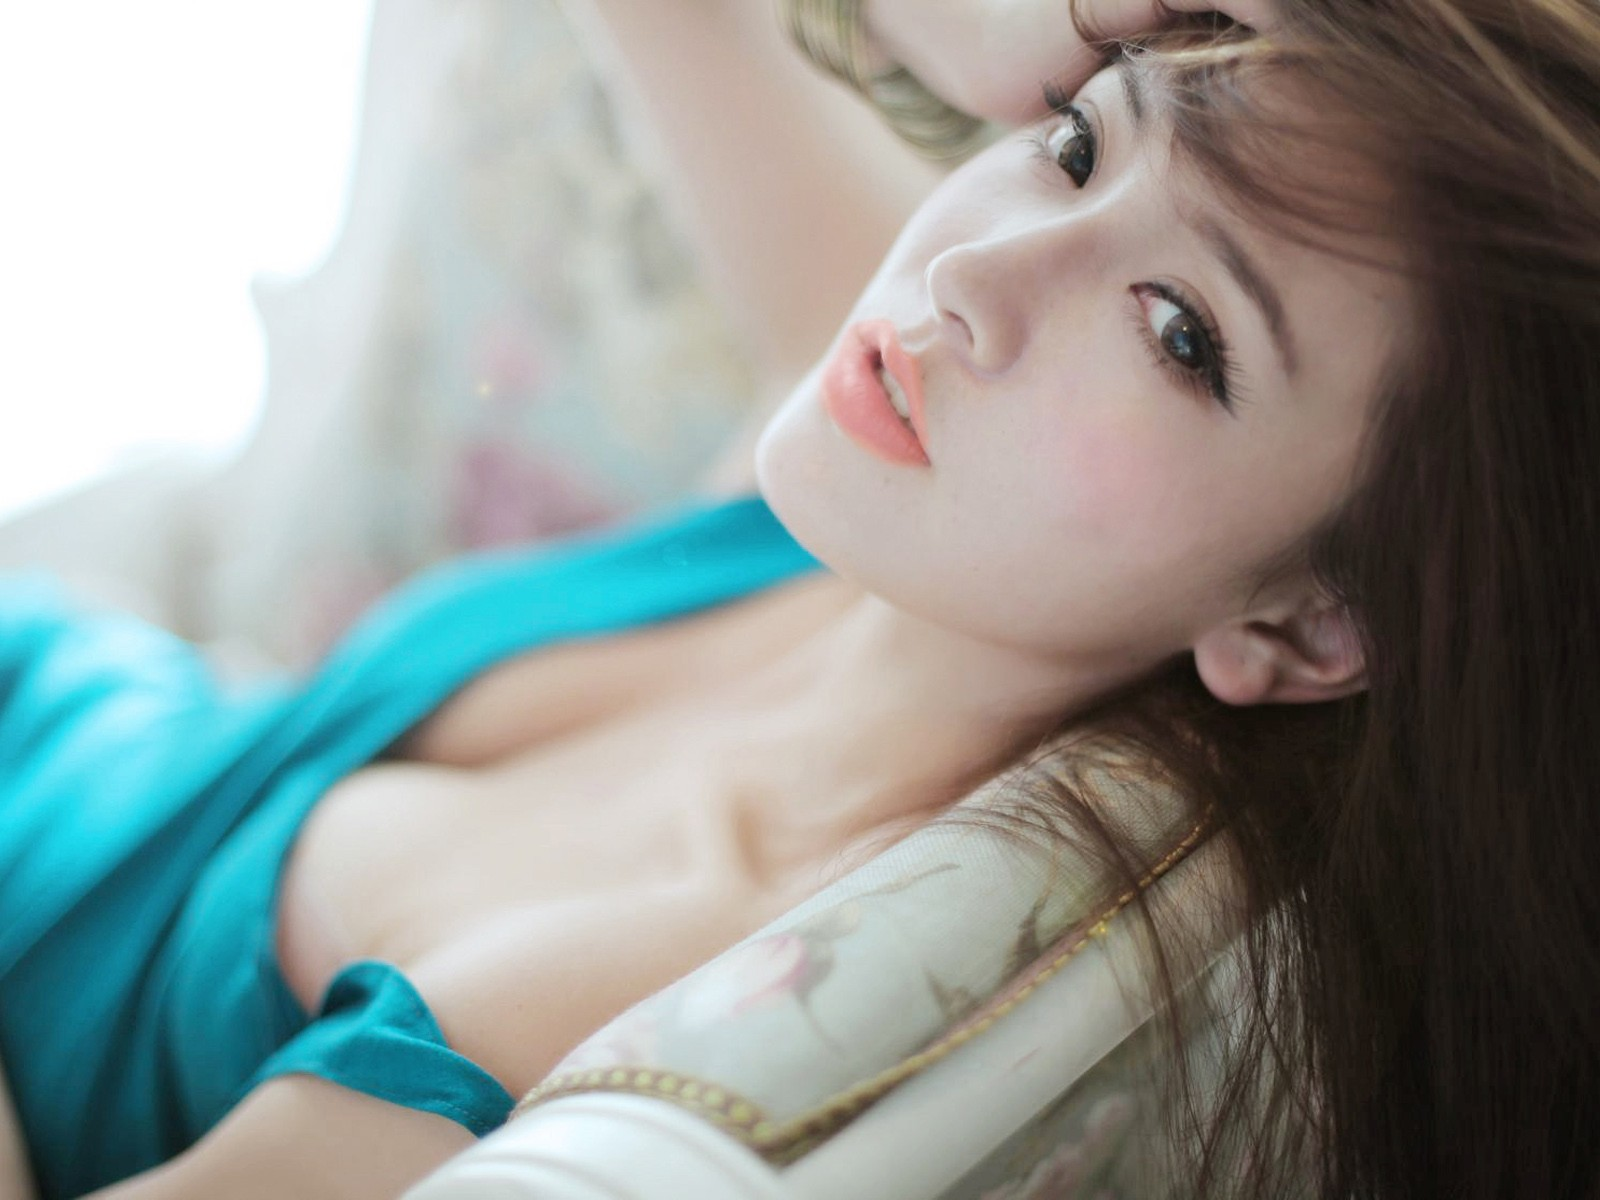 http://2.bp.blogspot.com/-FJqhX_HOBkY/UXwMNj8ojtI/AAAAAAAALUc/dZ0w11TqXmA/s1600/zhao-yu-fei-wallpaper.jpg